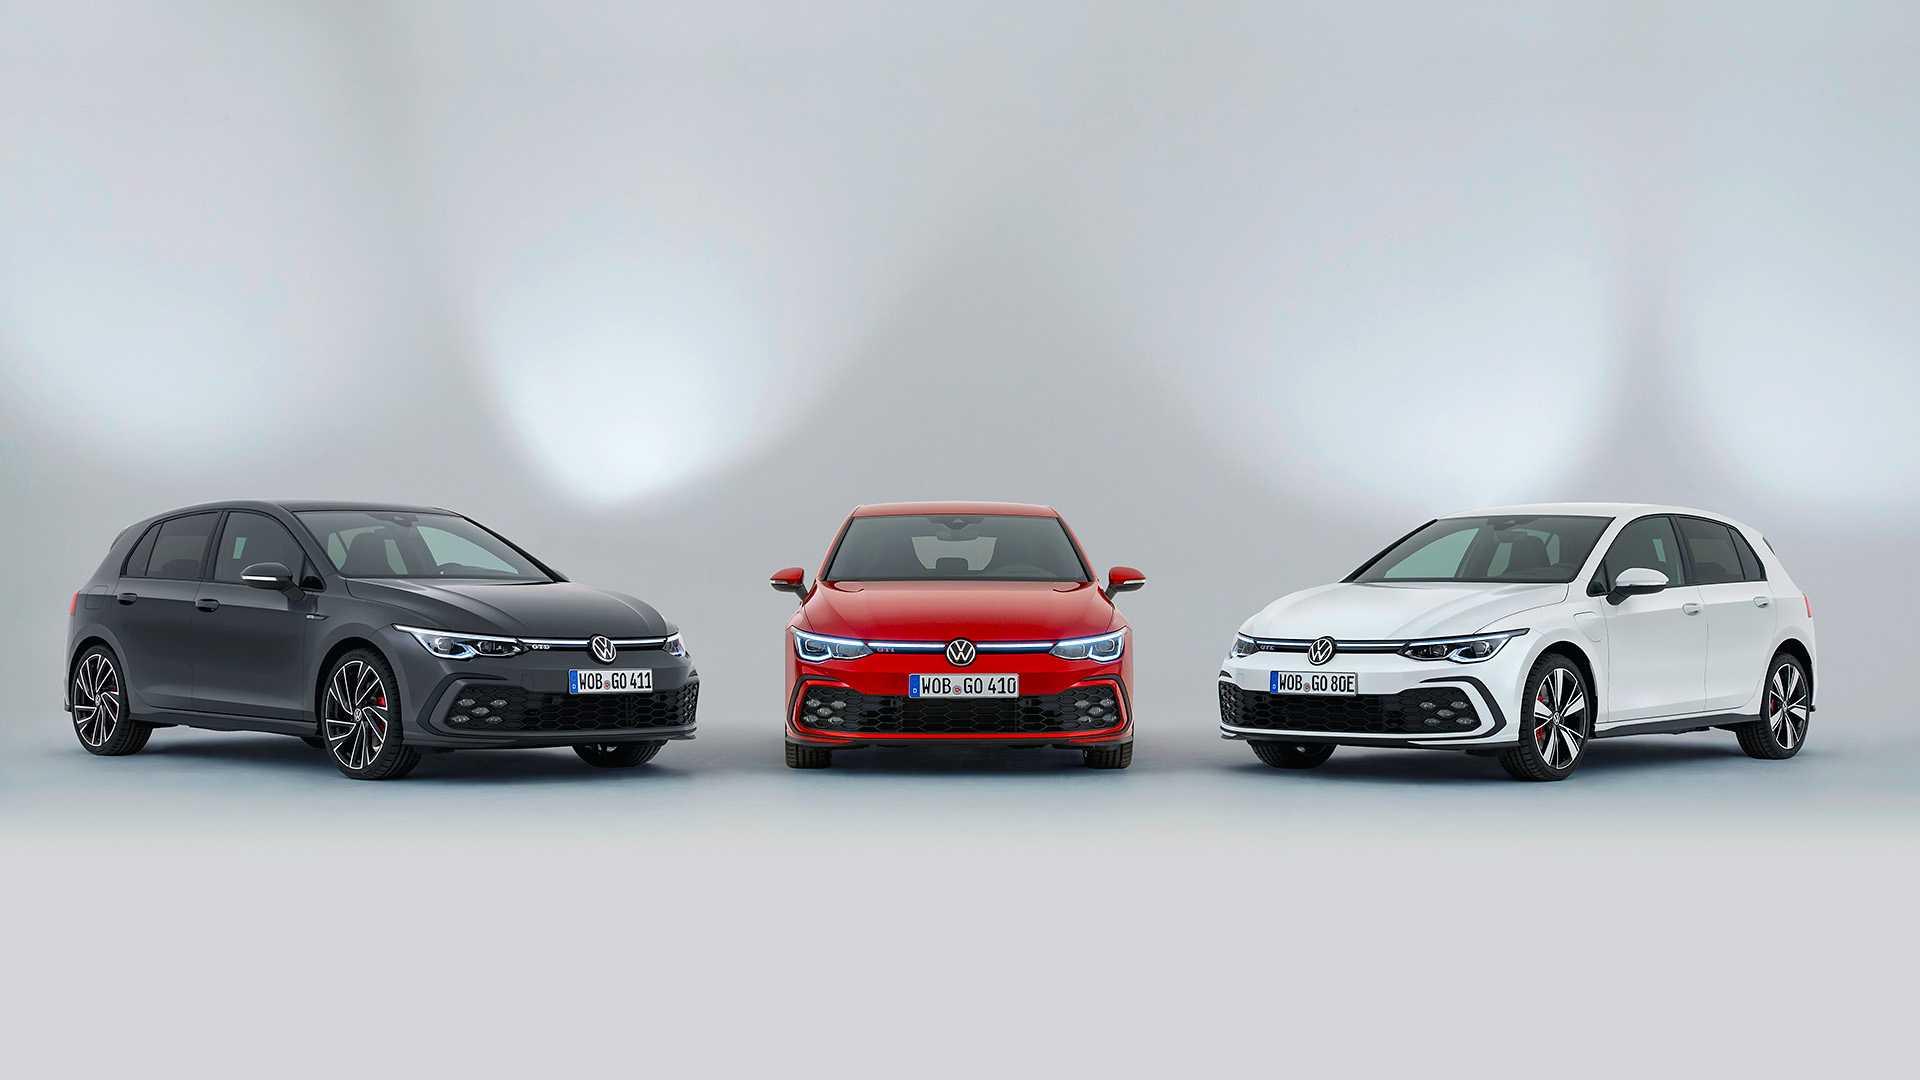 Volkswagen Golf w odmianacg GTI, GTD, GTE